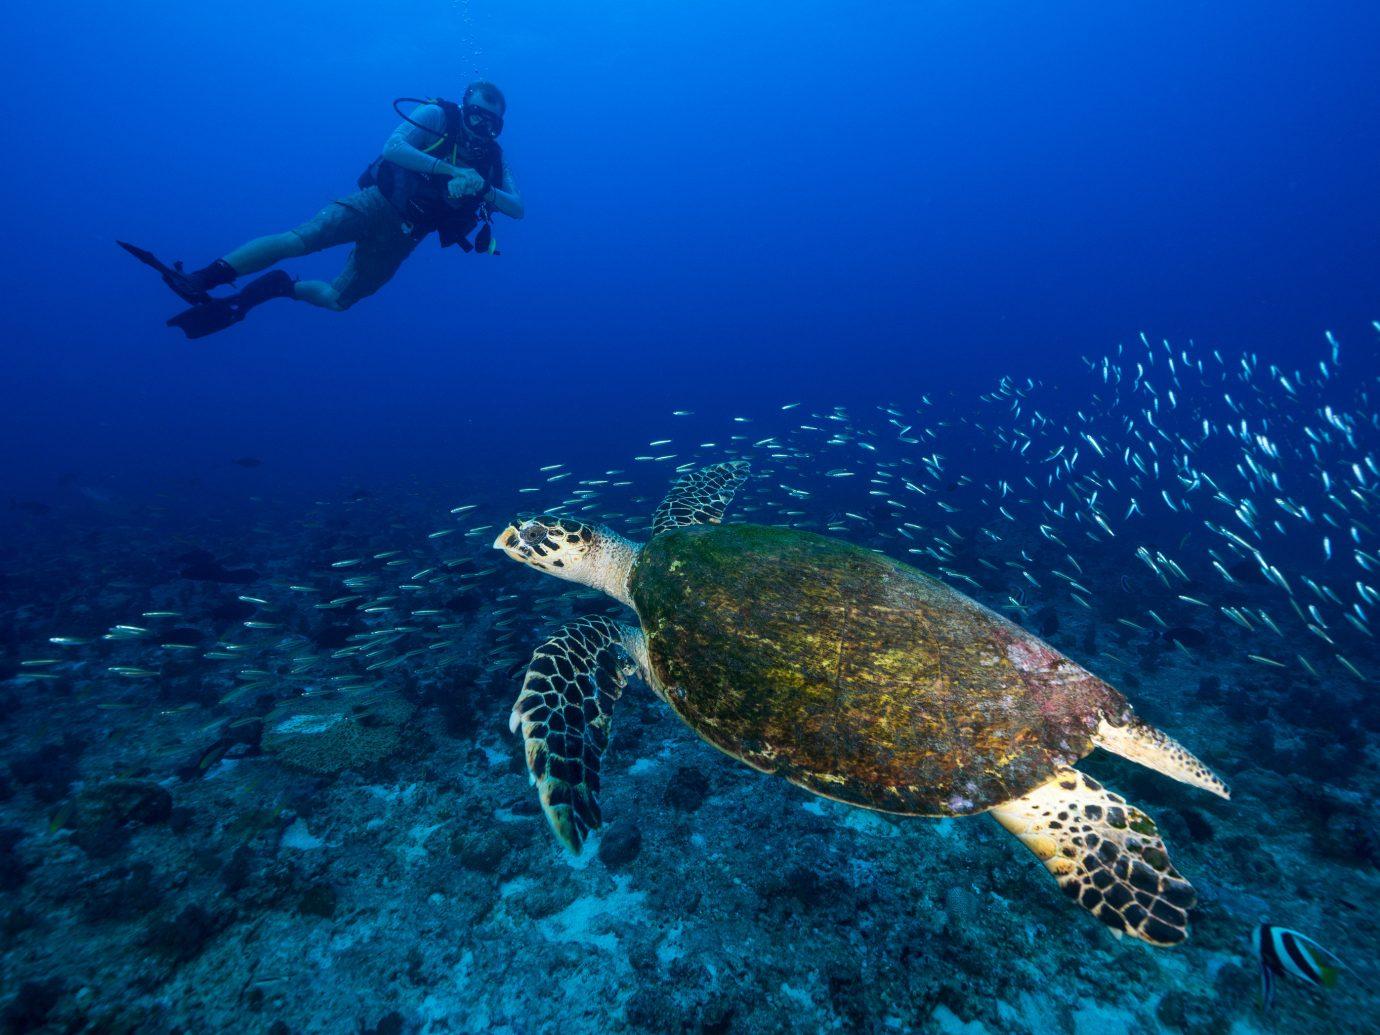 Luxury Travel Trip Ideas reptile sea turtle loggerhead marine biology turtle ecosystem underwater water animal Sea organism coral reef reef divemaster underwater diving Scuba Diving coral aquanaut Ocean tortoise blue ocean floor